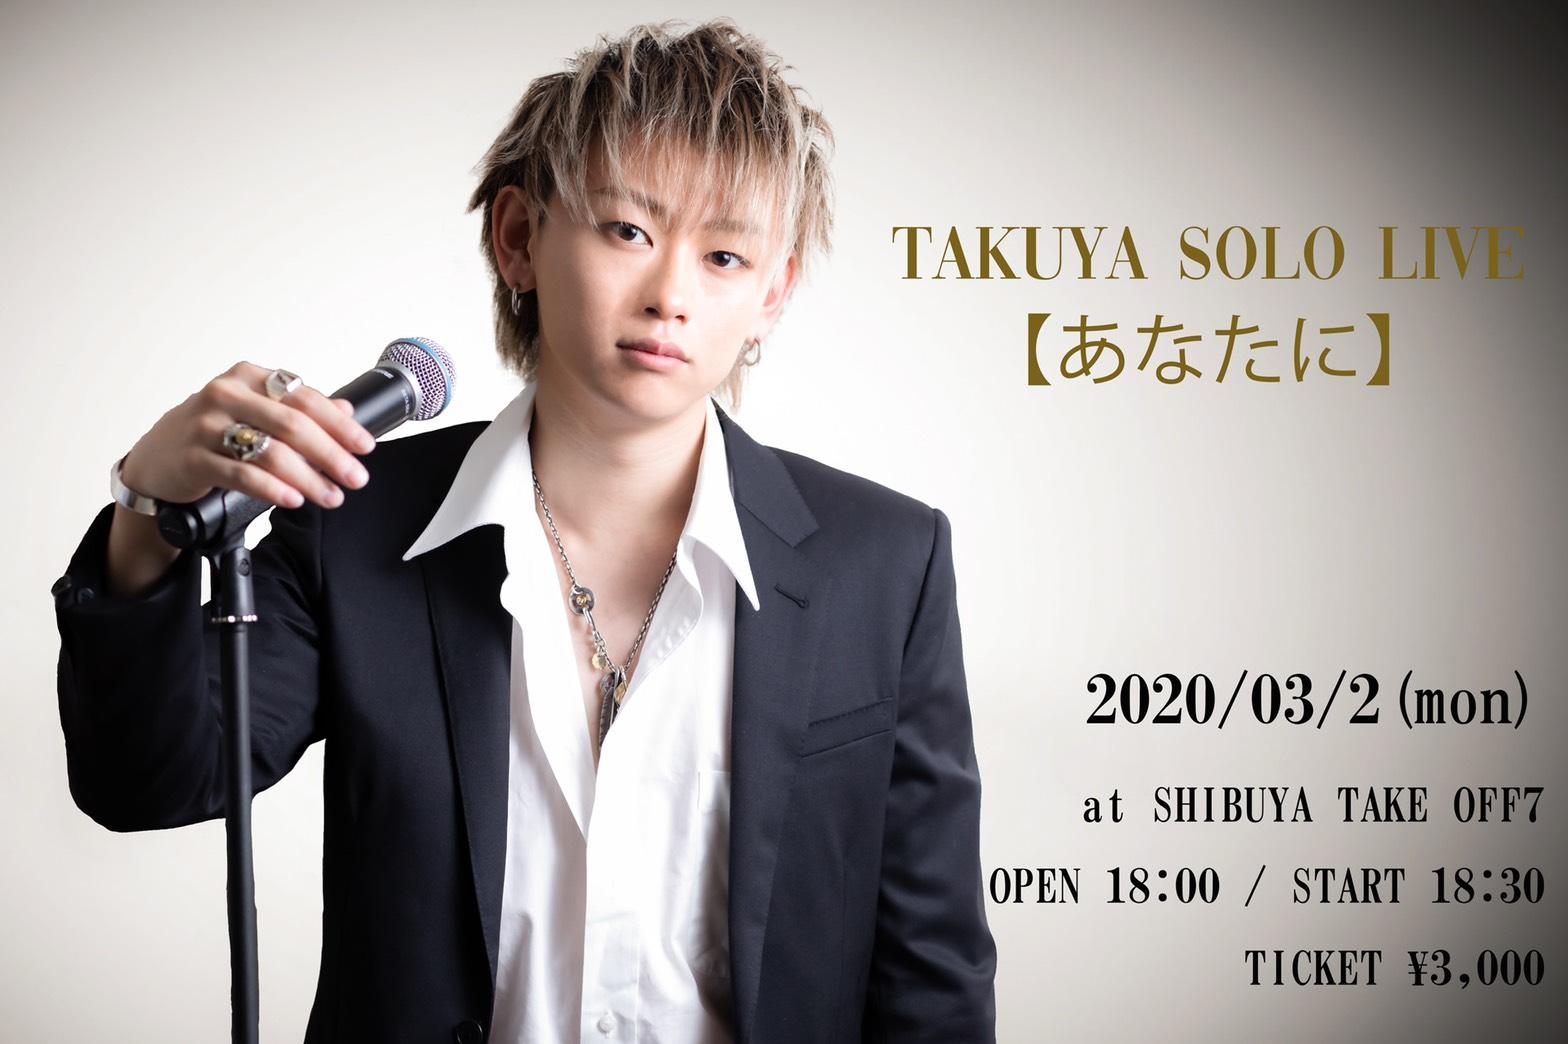 TAKUYA SOLO LIVE